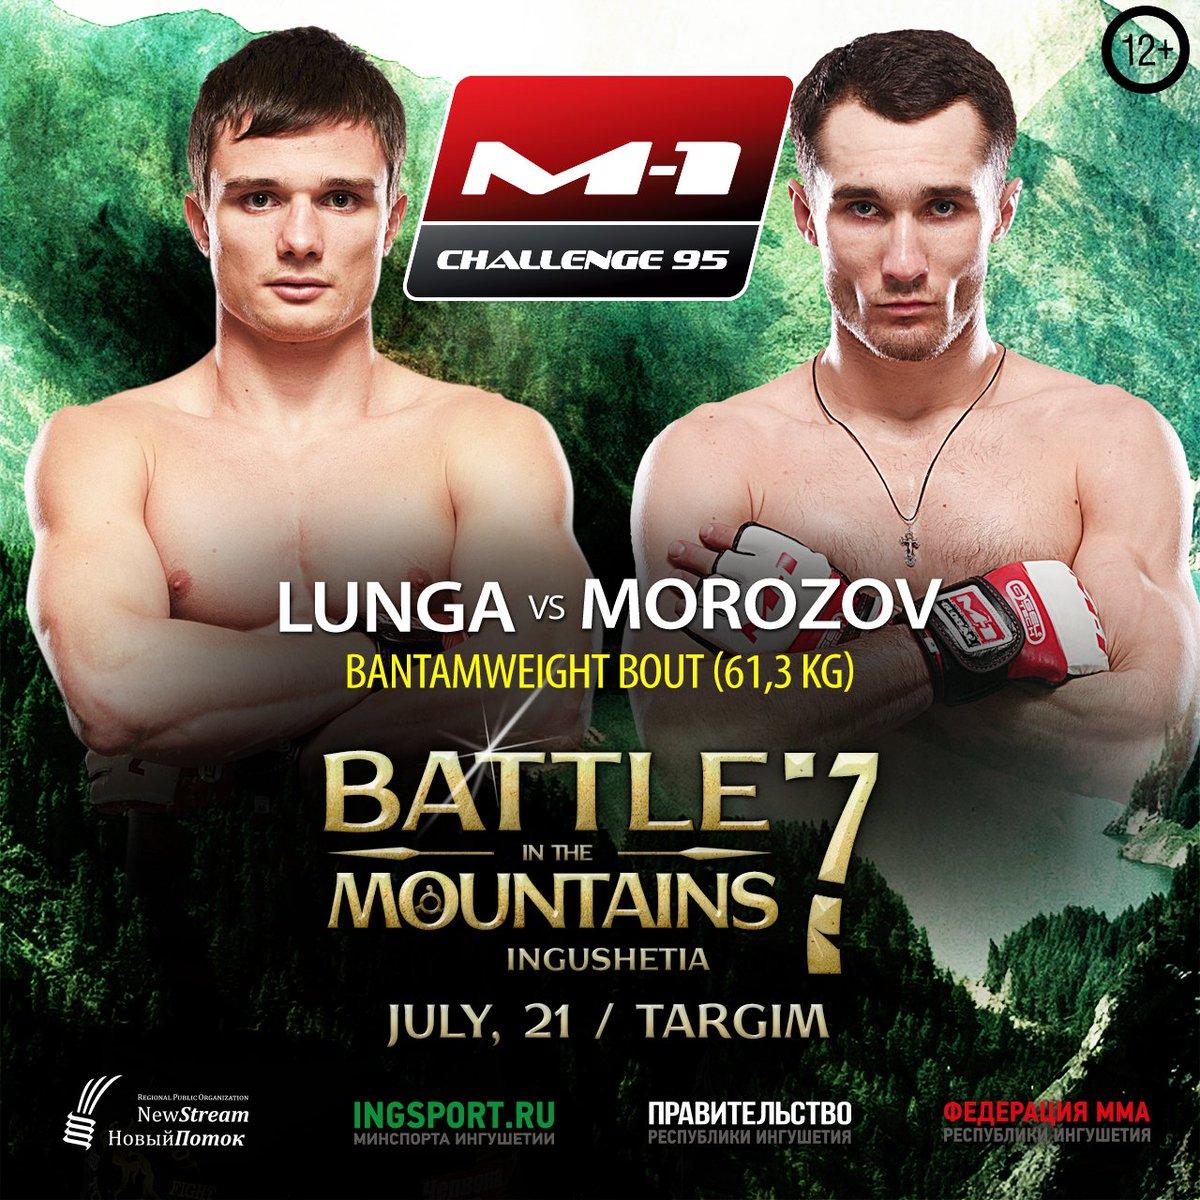 Sergey Morozov today 57